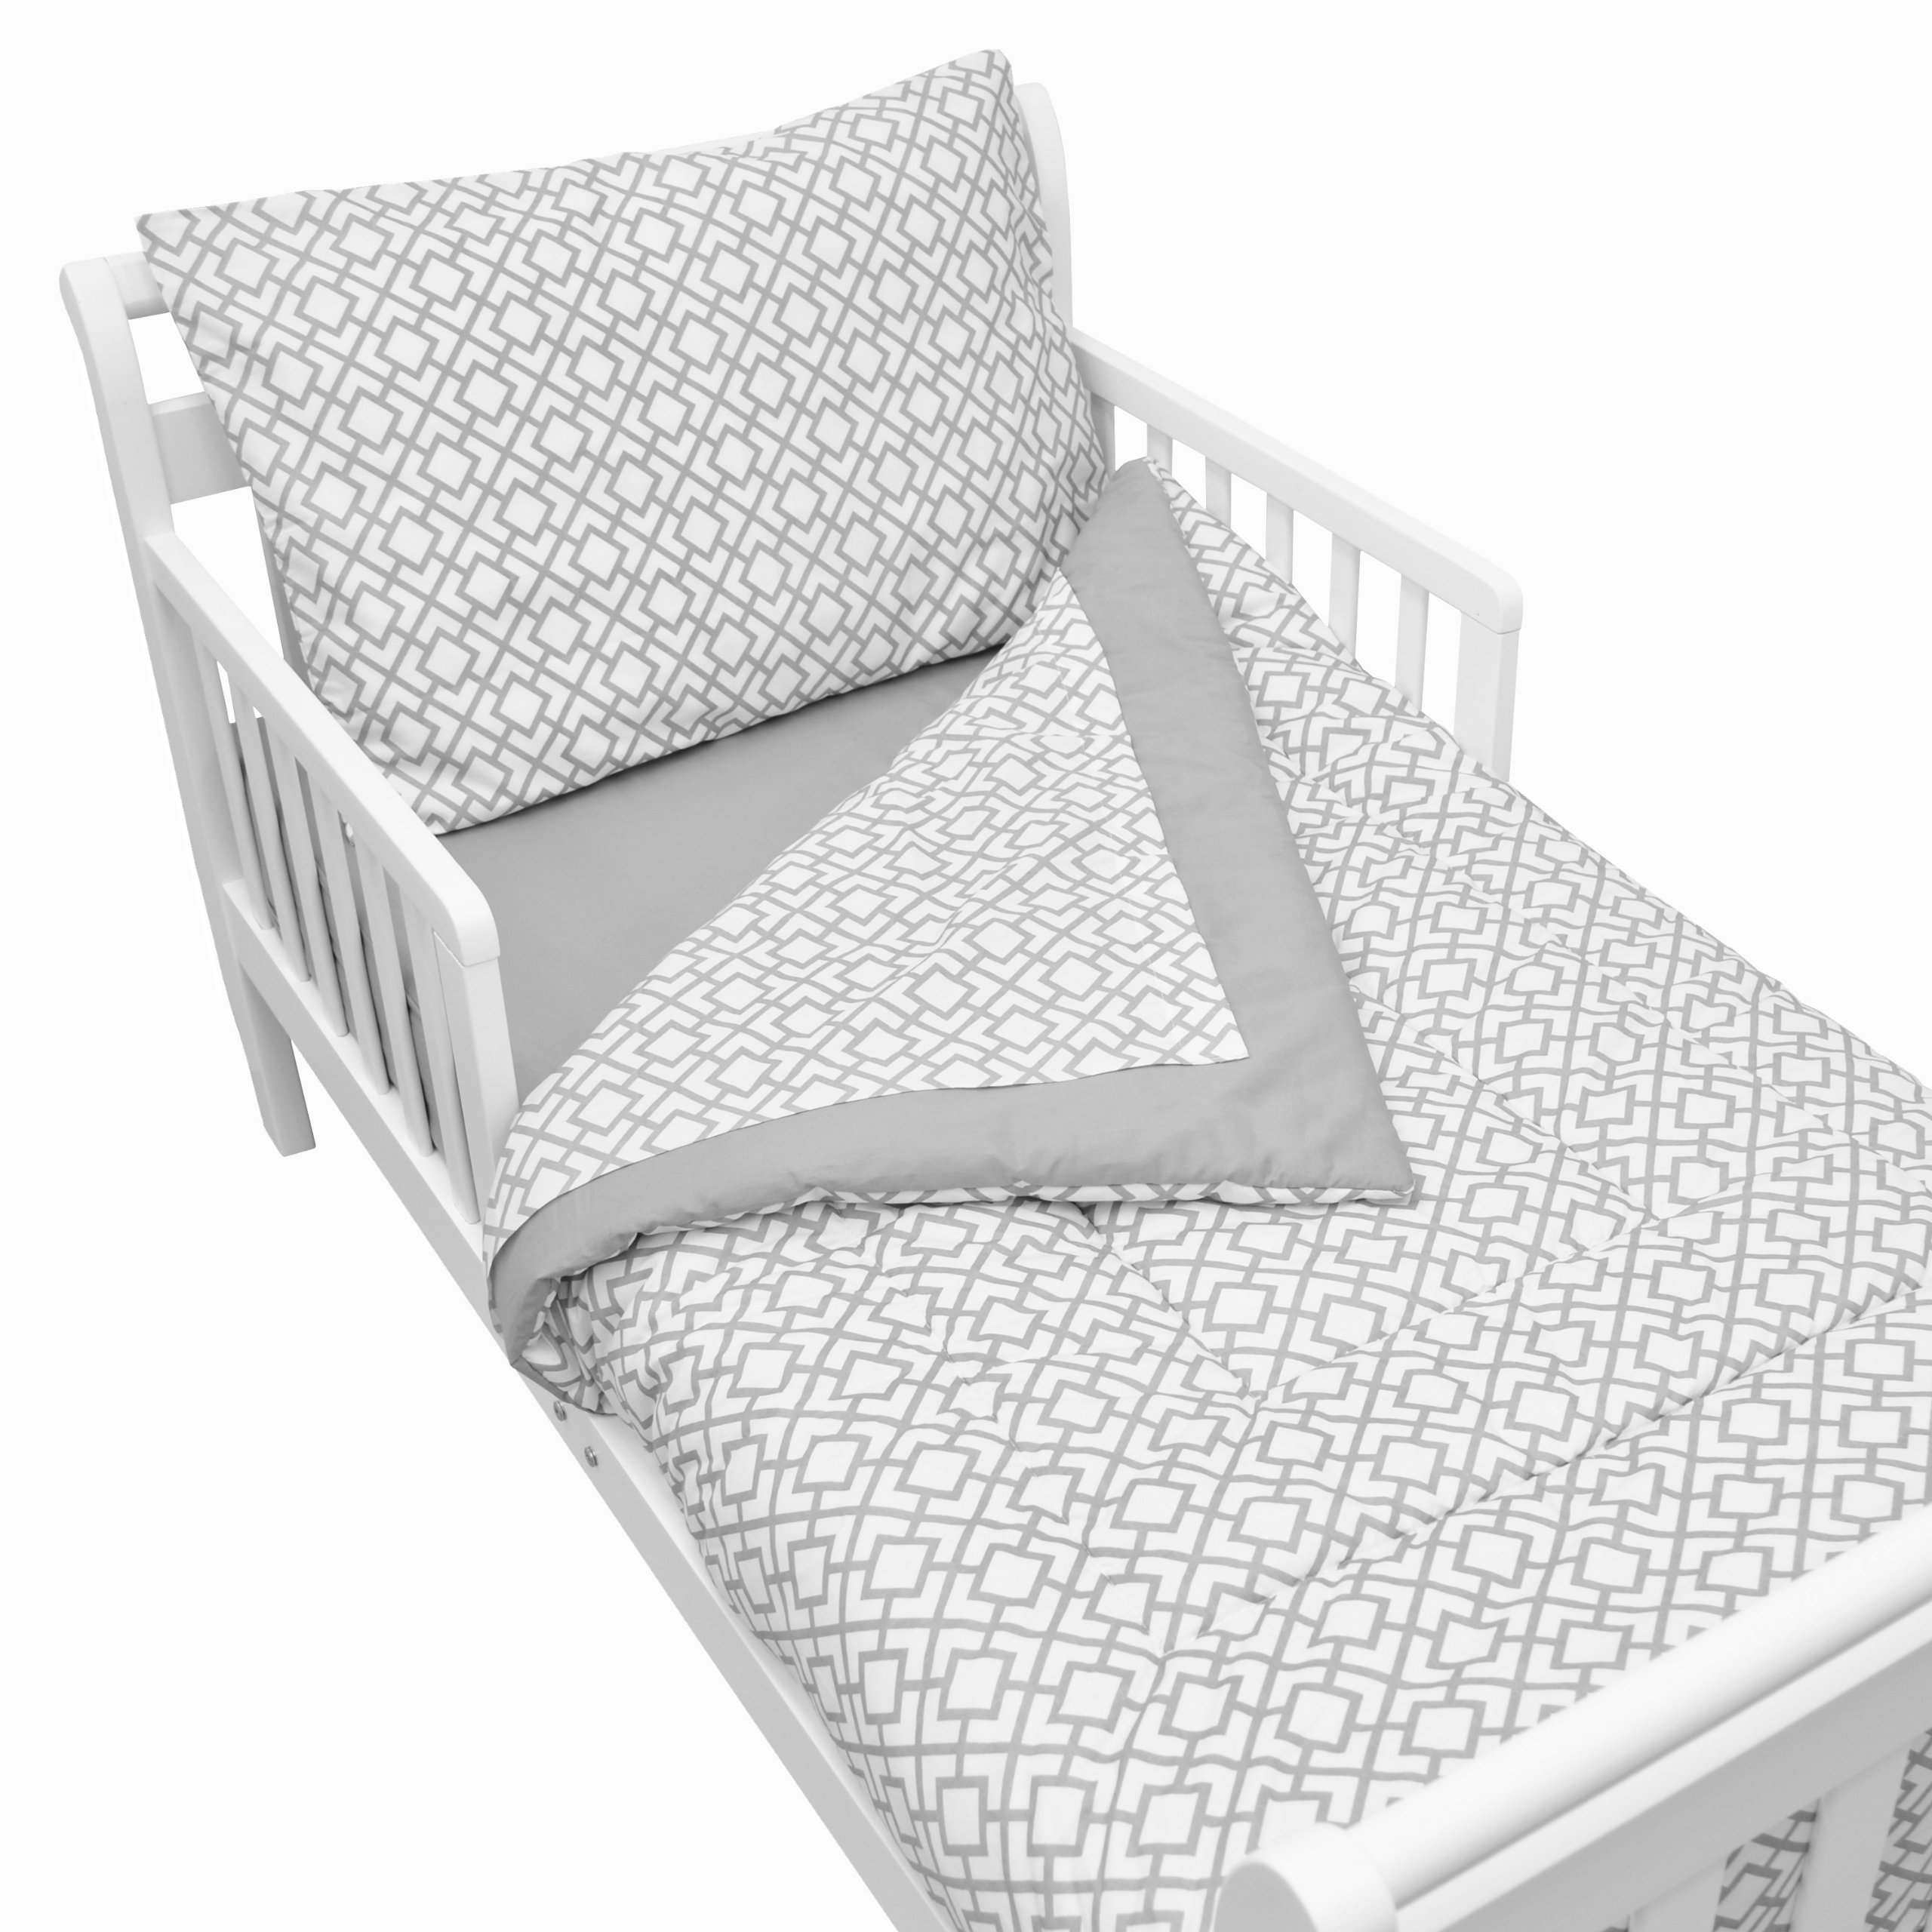 American Baby Company 100% Cotton Percale 4-piece Toddler Bedding Set, Gray Lattice